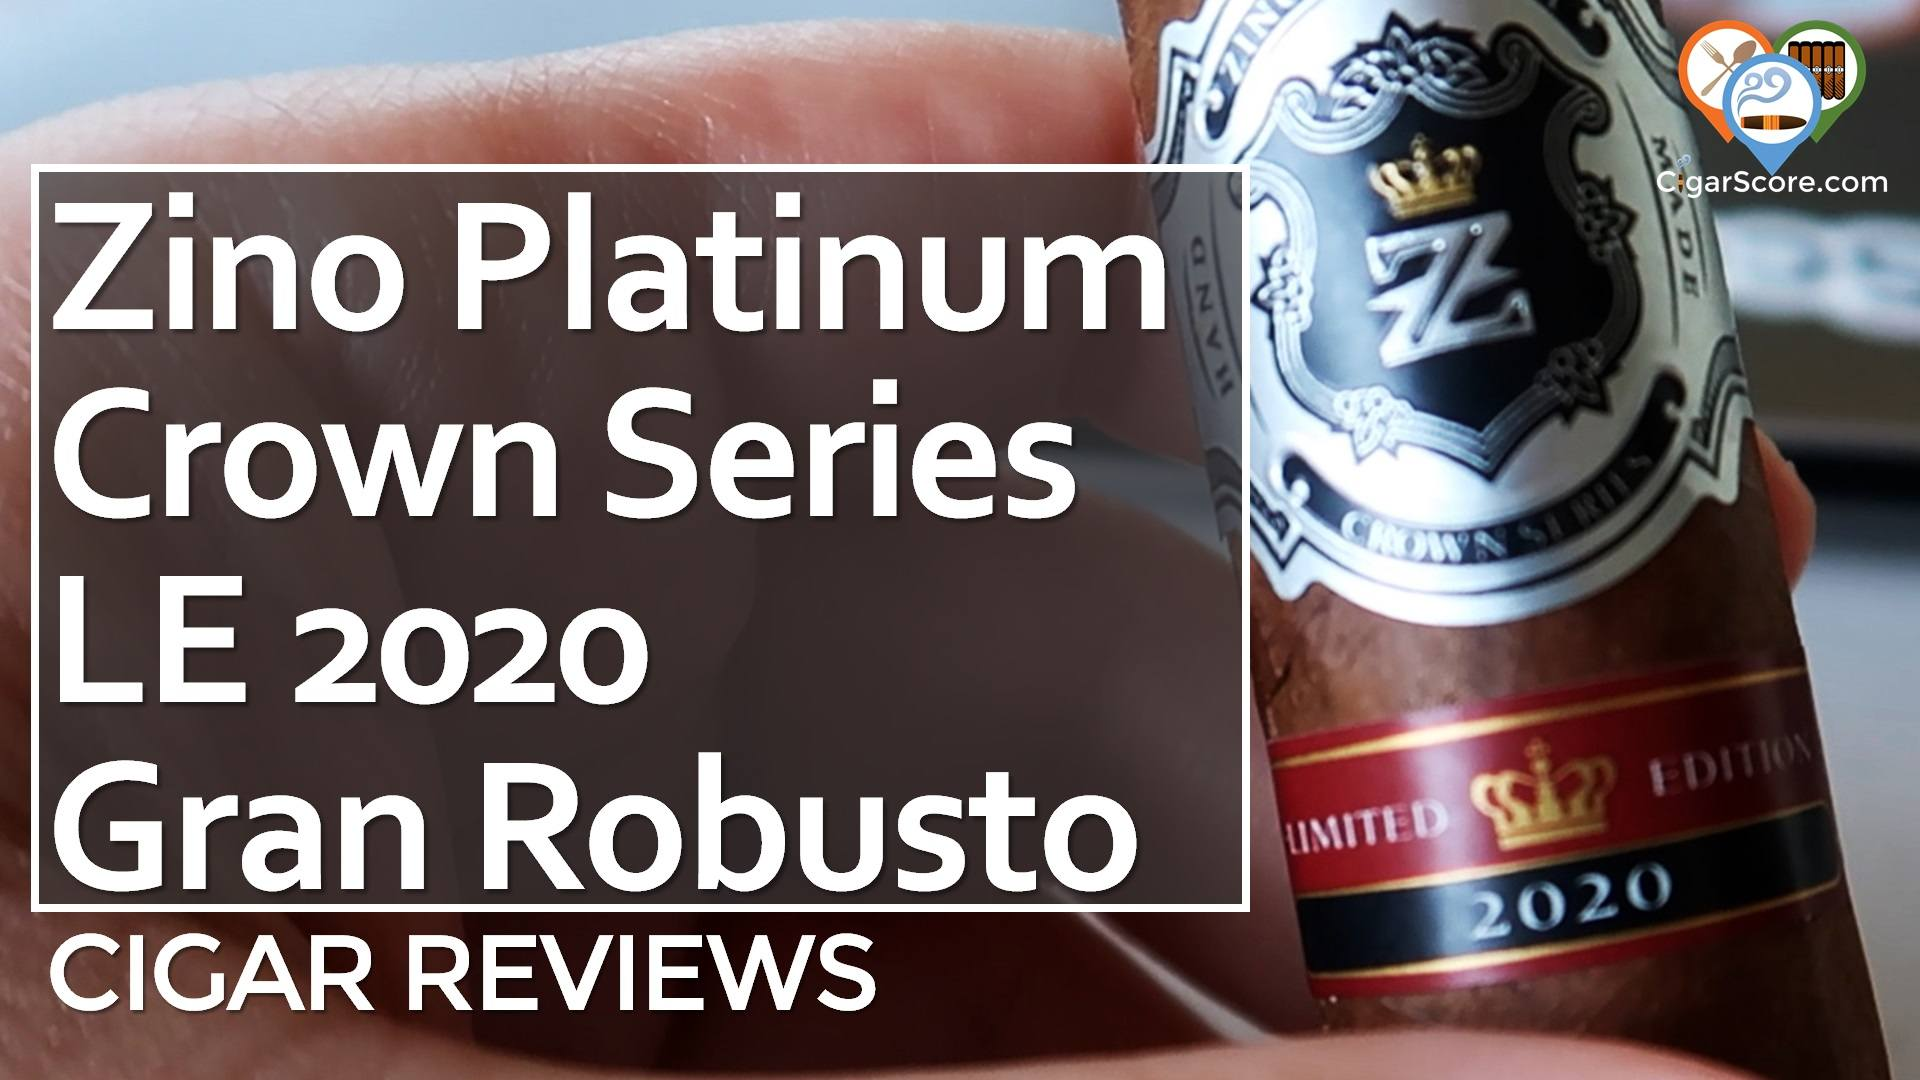 Cigar Review Zino Platinum Crown Series Limited Edition 2020 Gran Robusto